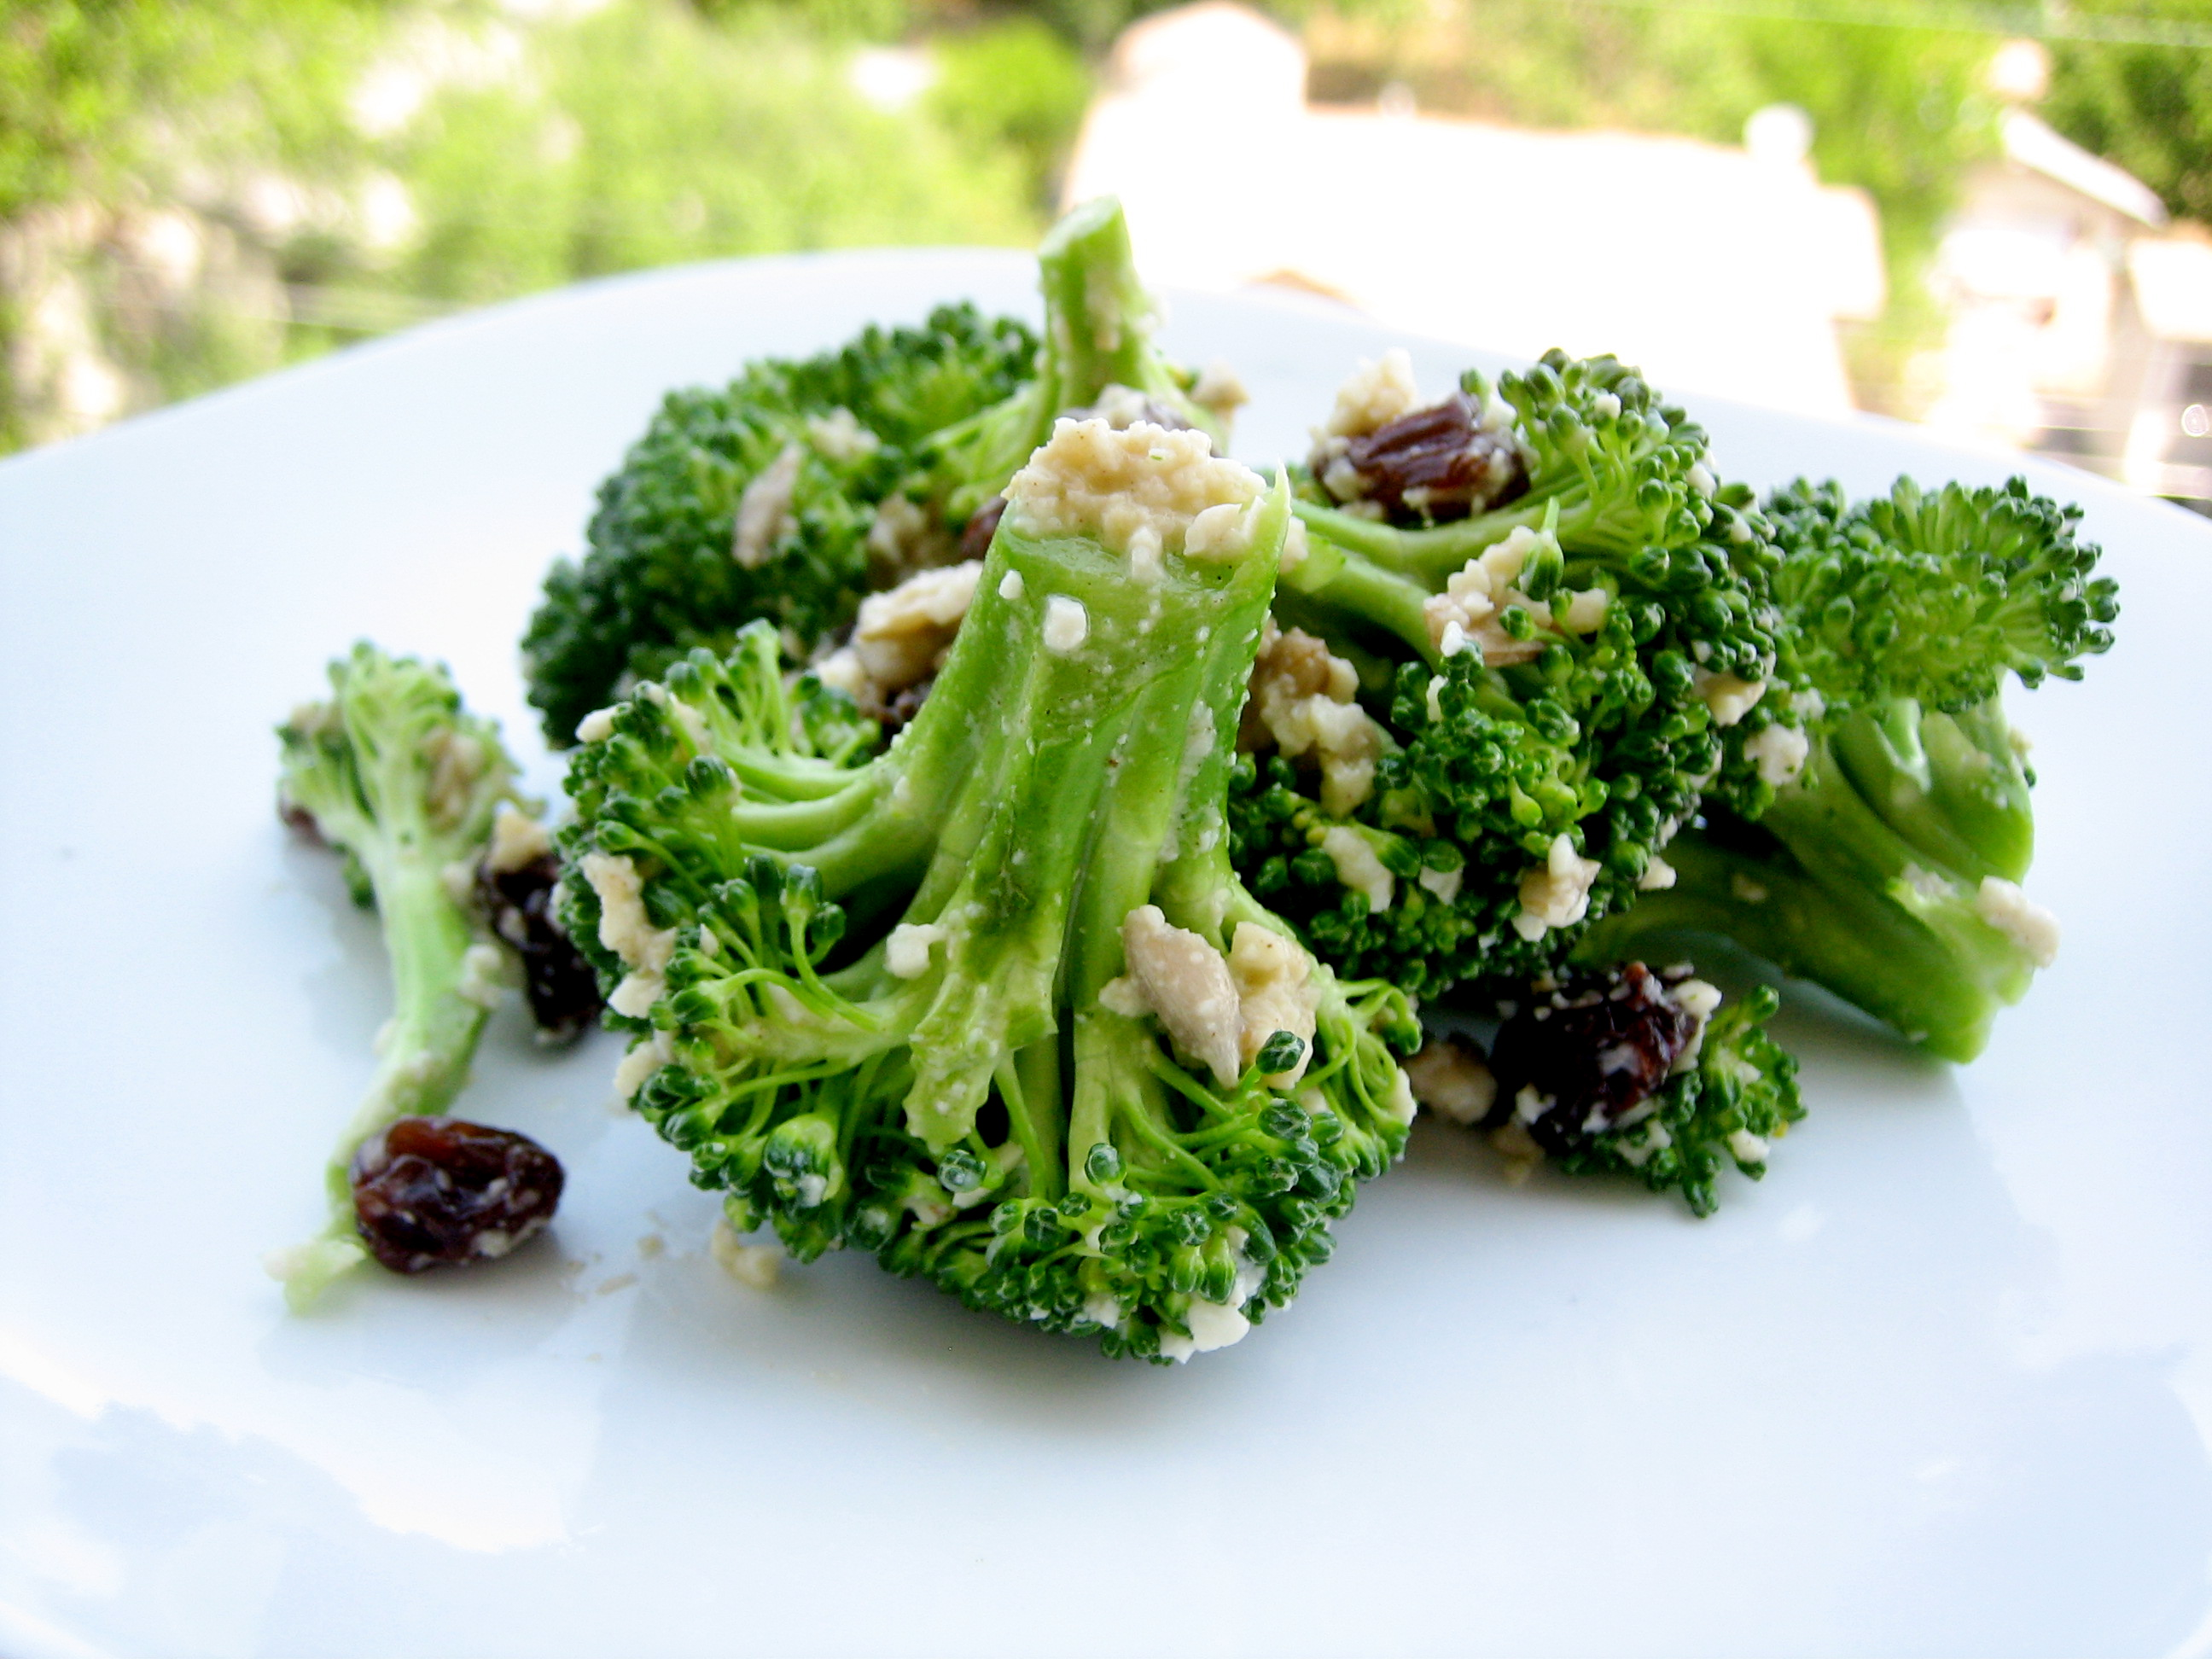 Broccoli k